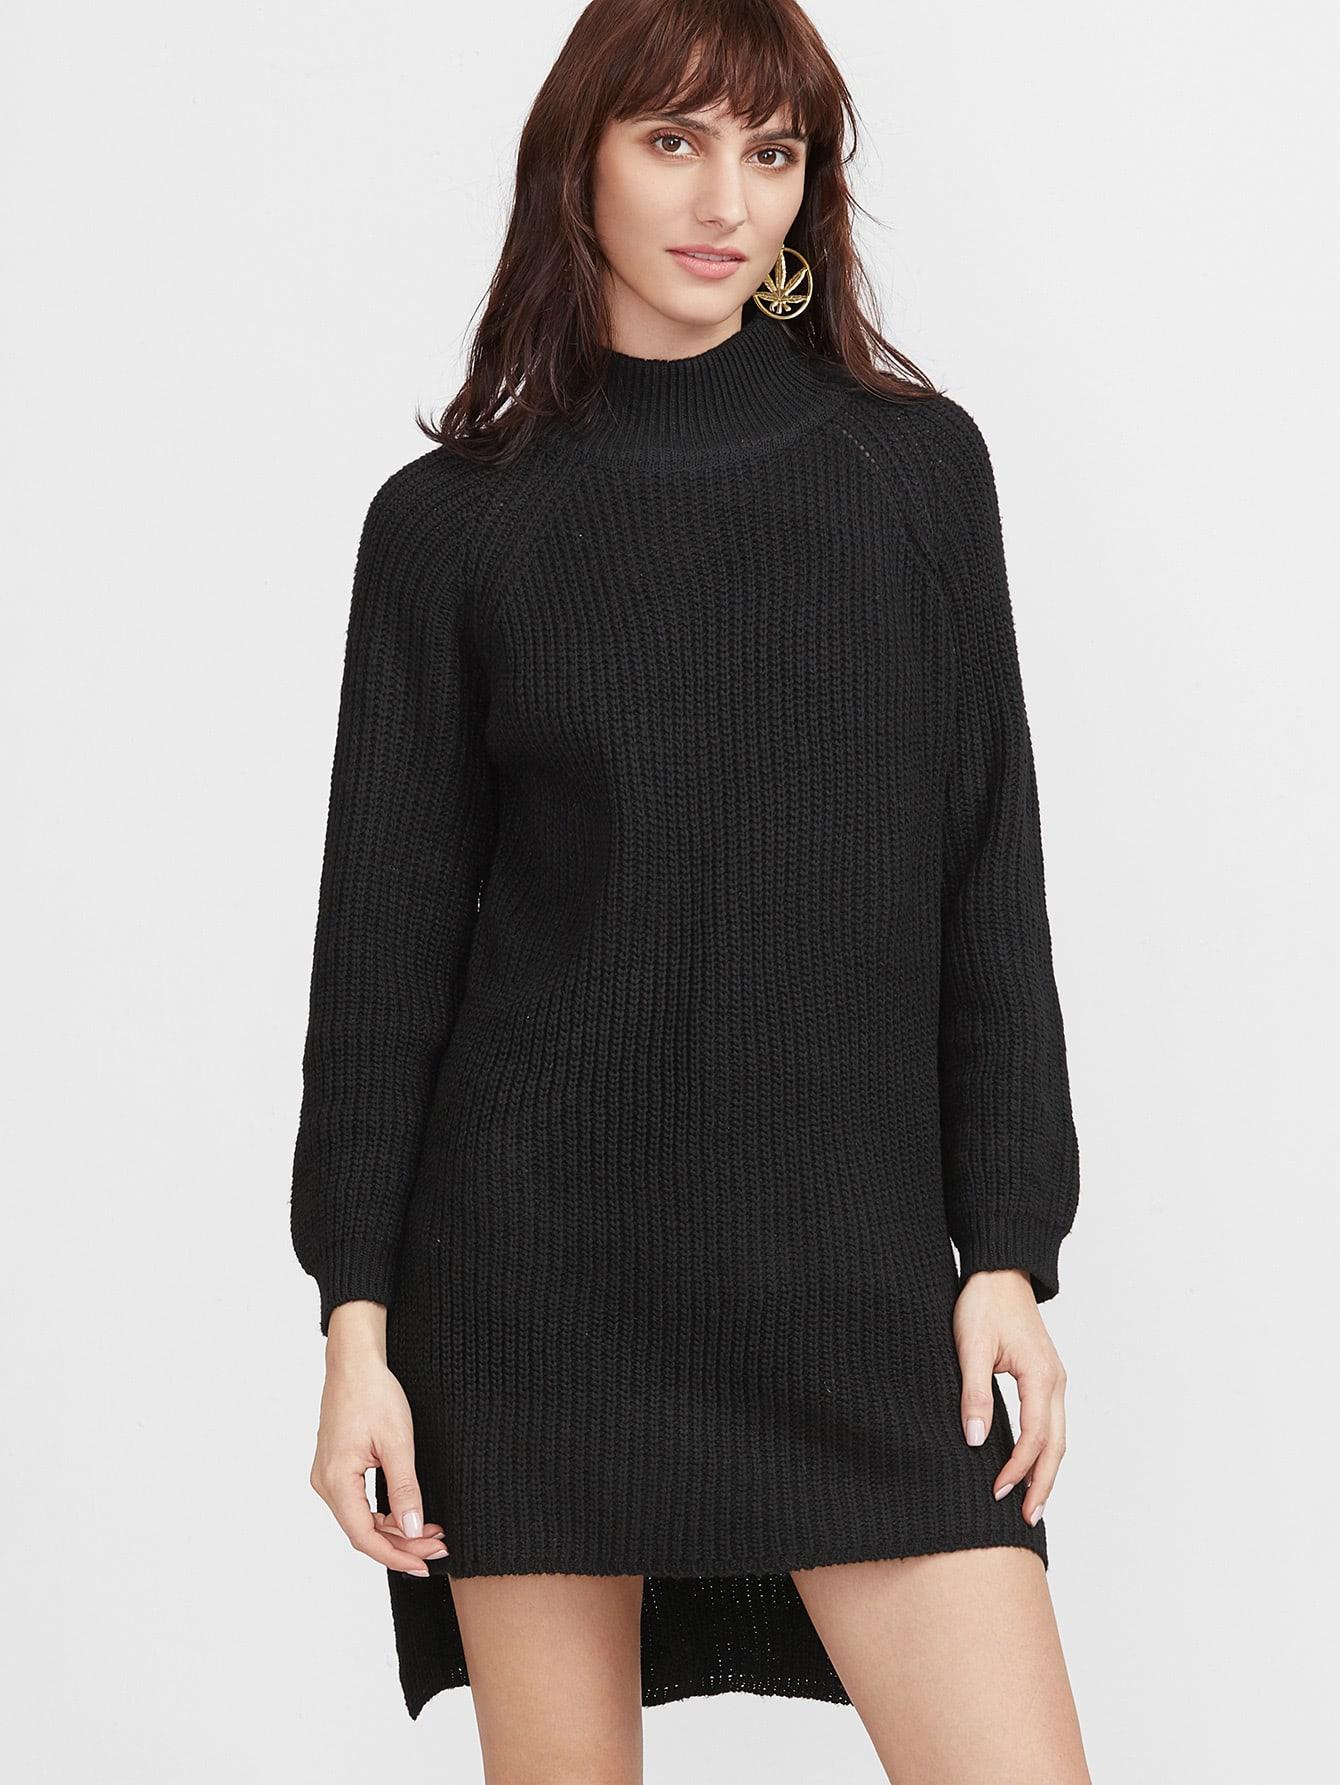 Black Turtleneck Side Slit High Low Sweater sweater161213132